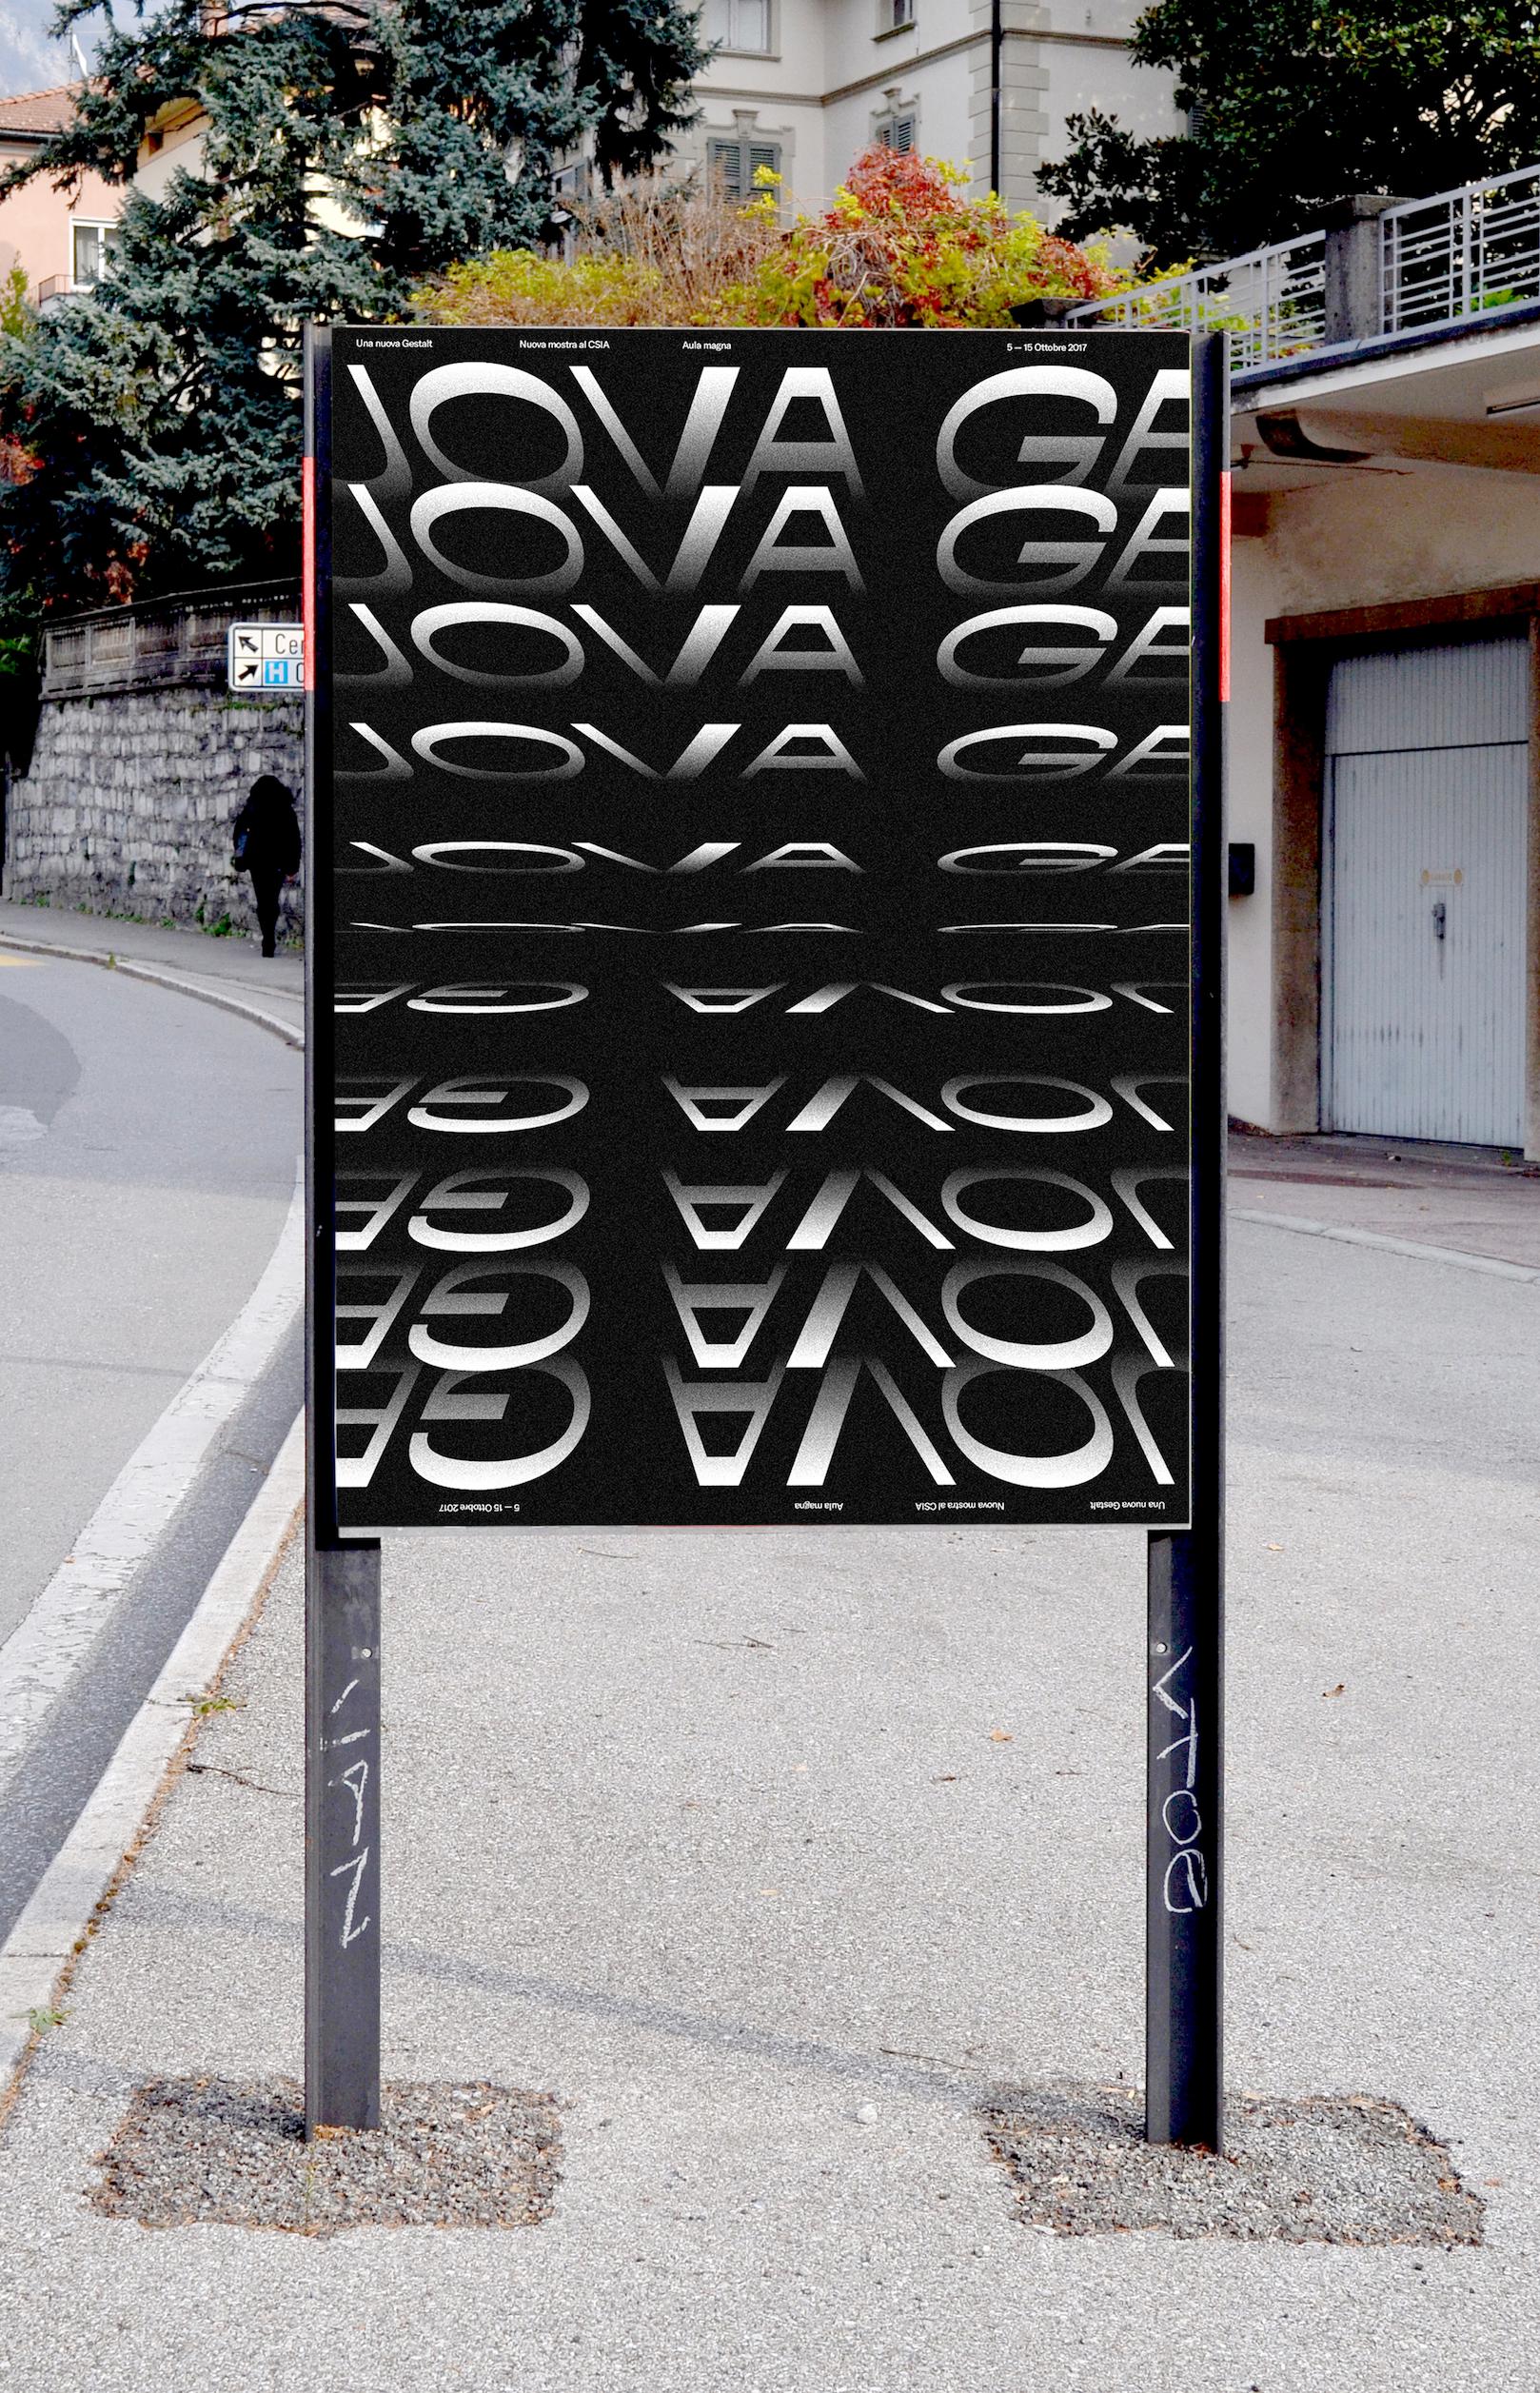 Exceptionnel Ares Pedroli - Una nuova Gestalt | DeeSai | Pinterest | Typography  JQ12